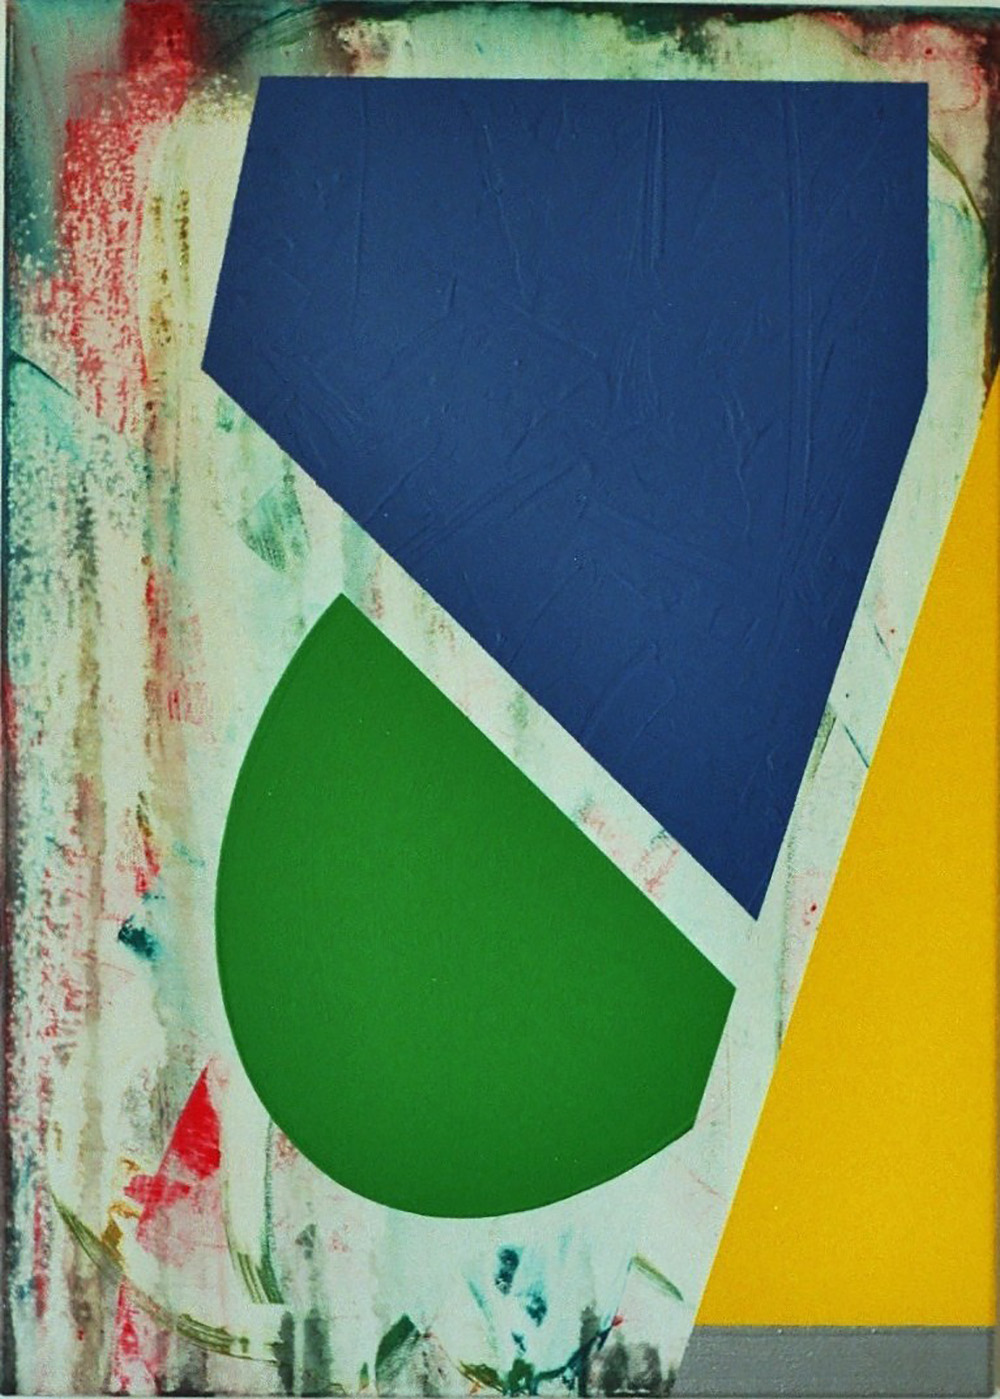 Relief-2 | Acryl auf Leinwand | 2010 | 70 x 50 cm